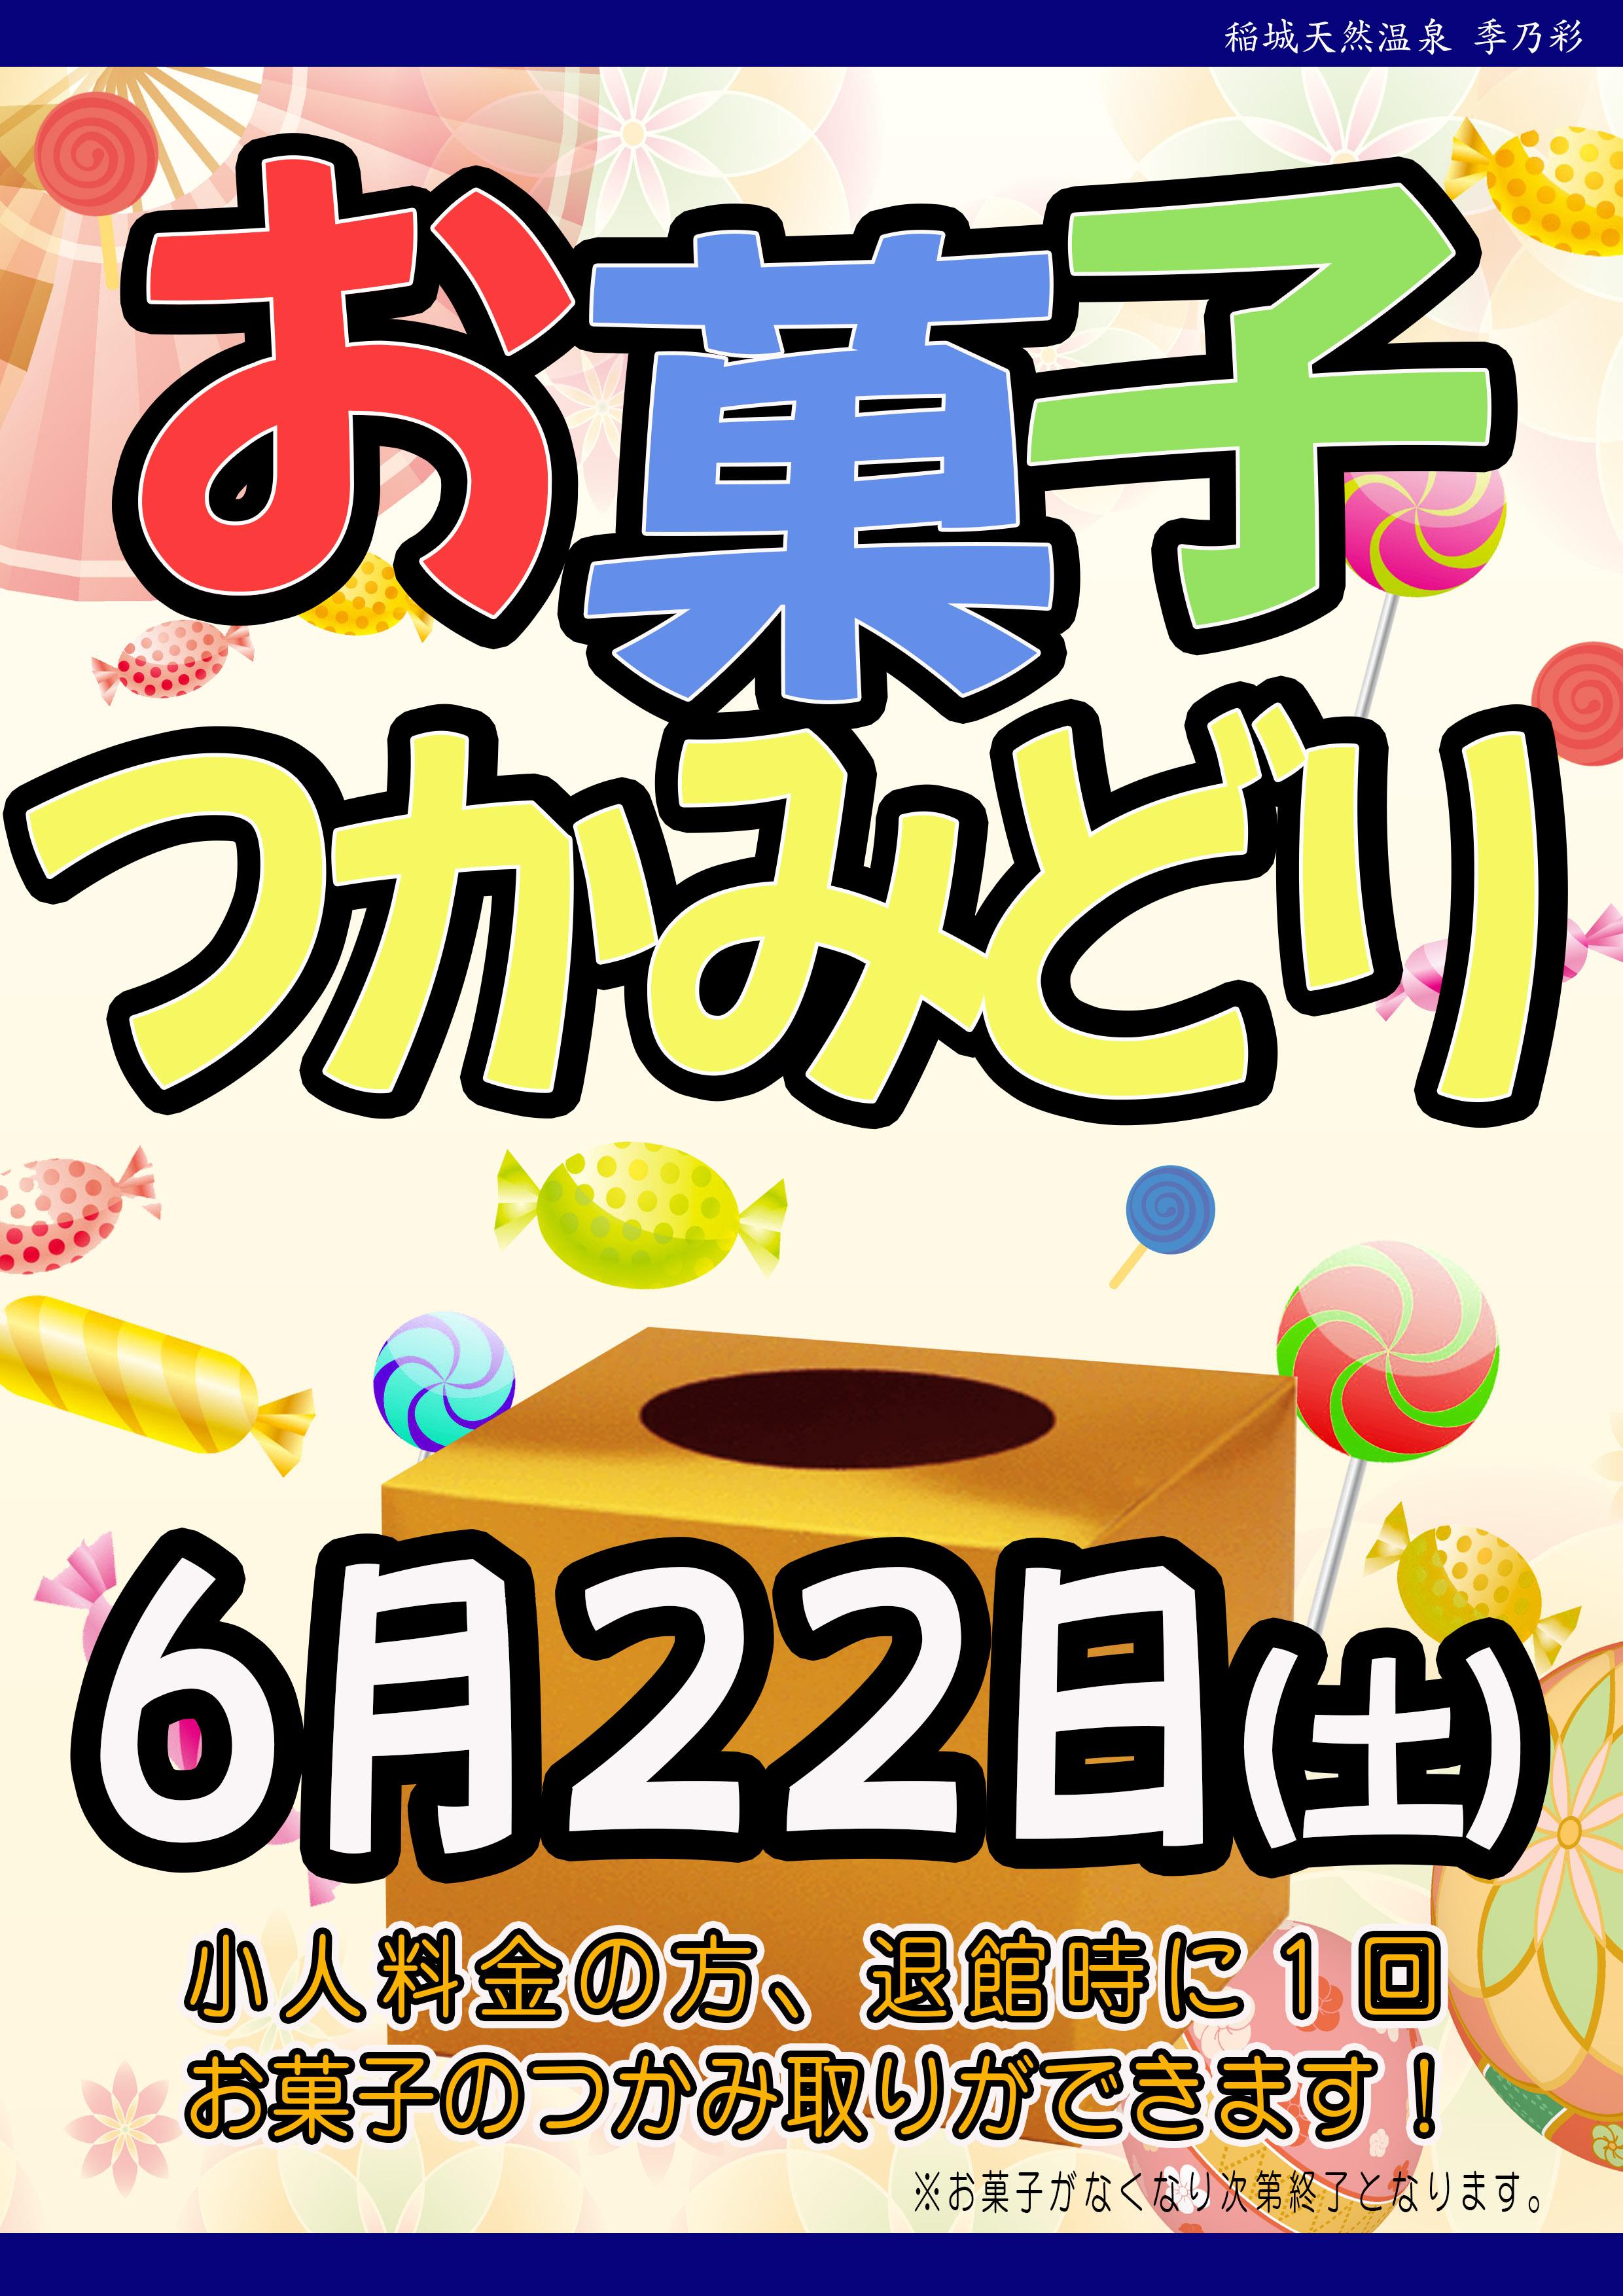 POP イベント お菓子つかみ取り 6月